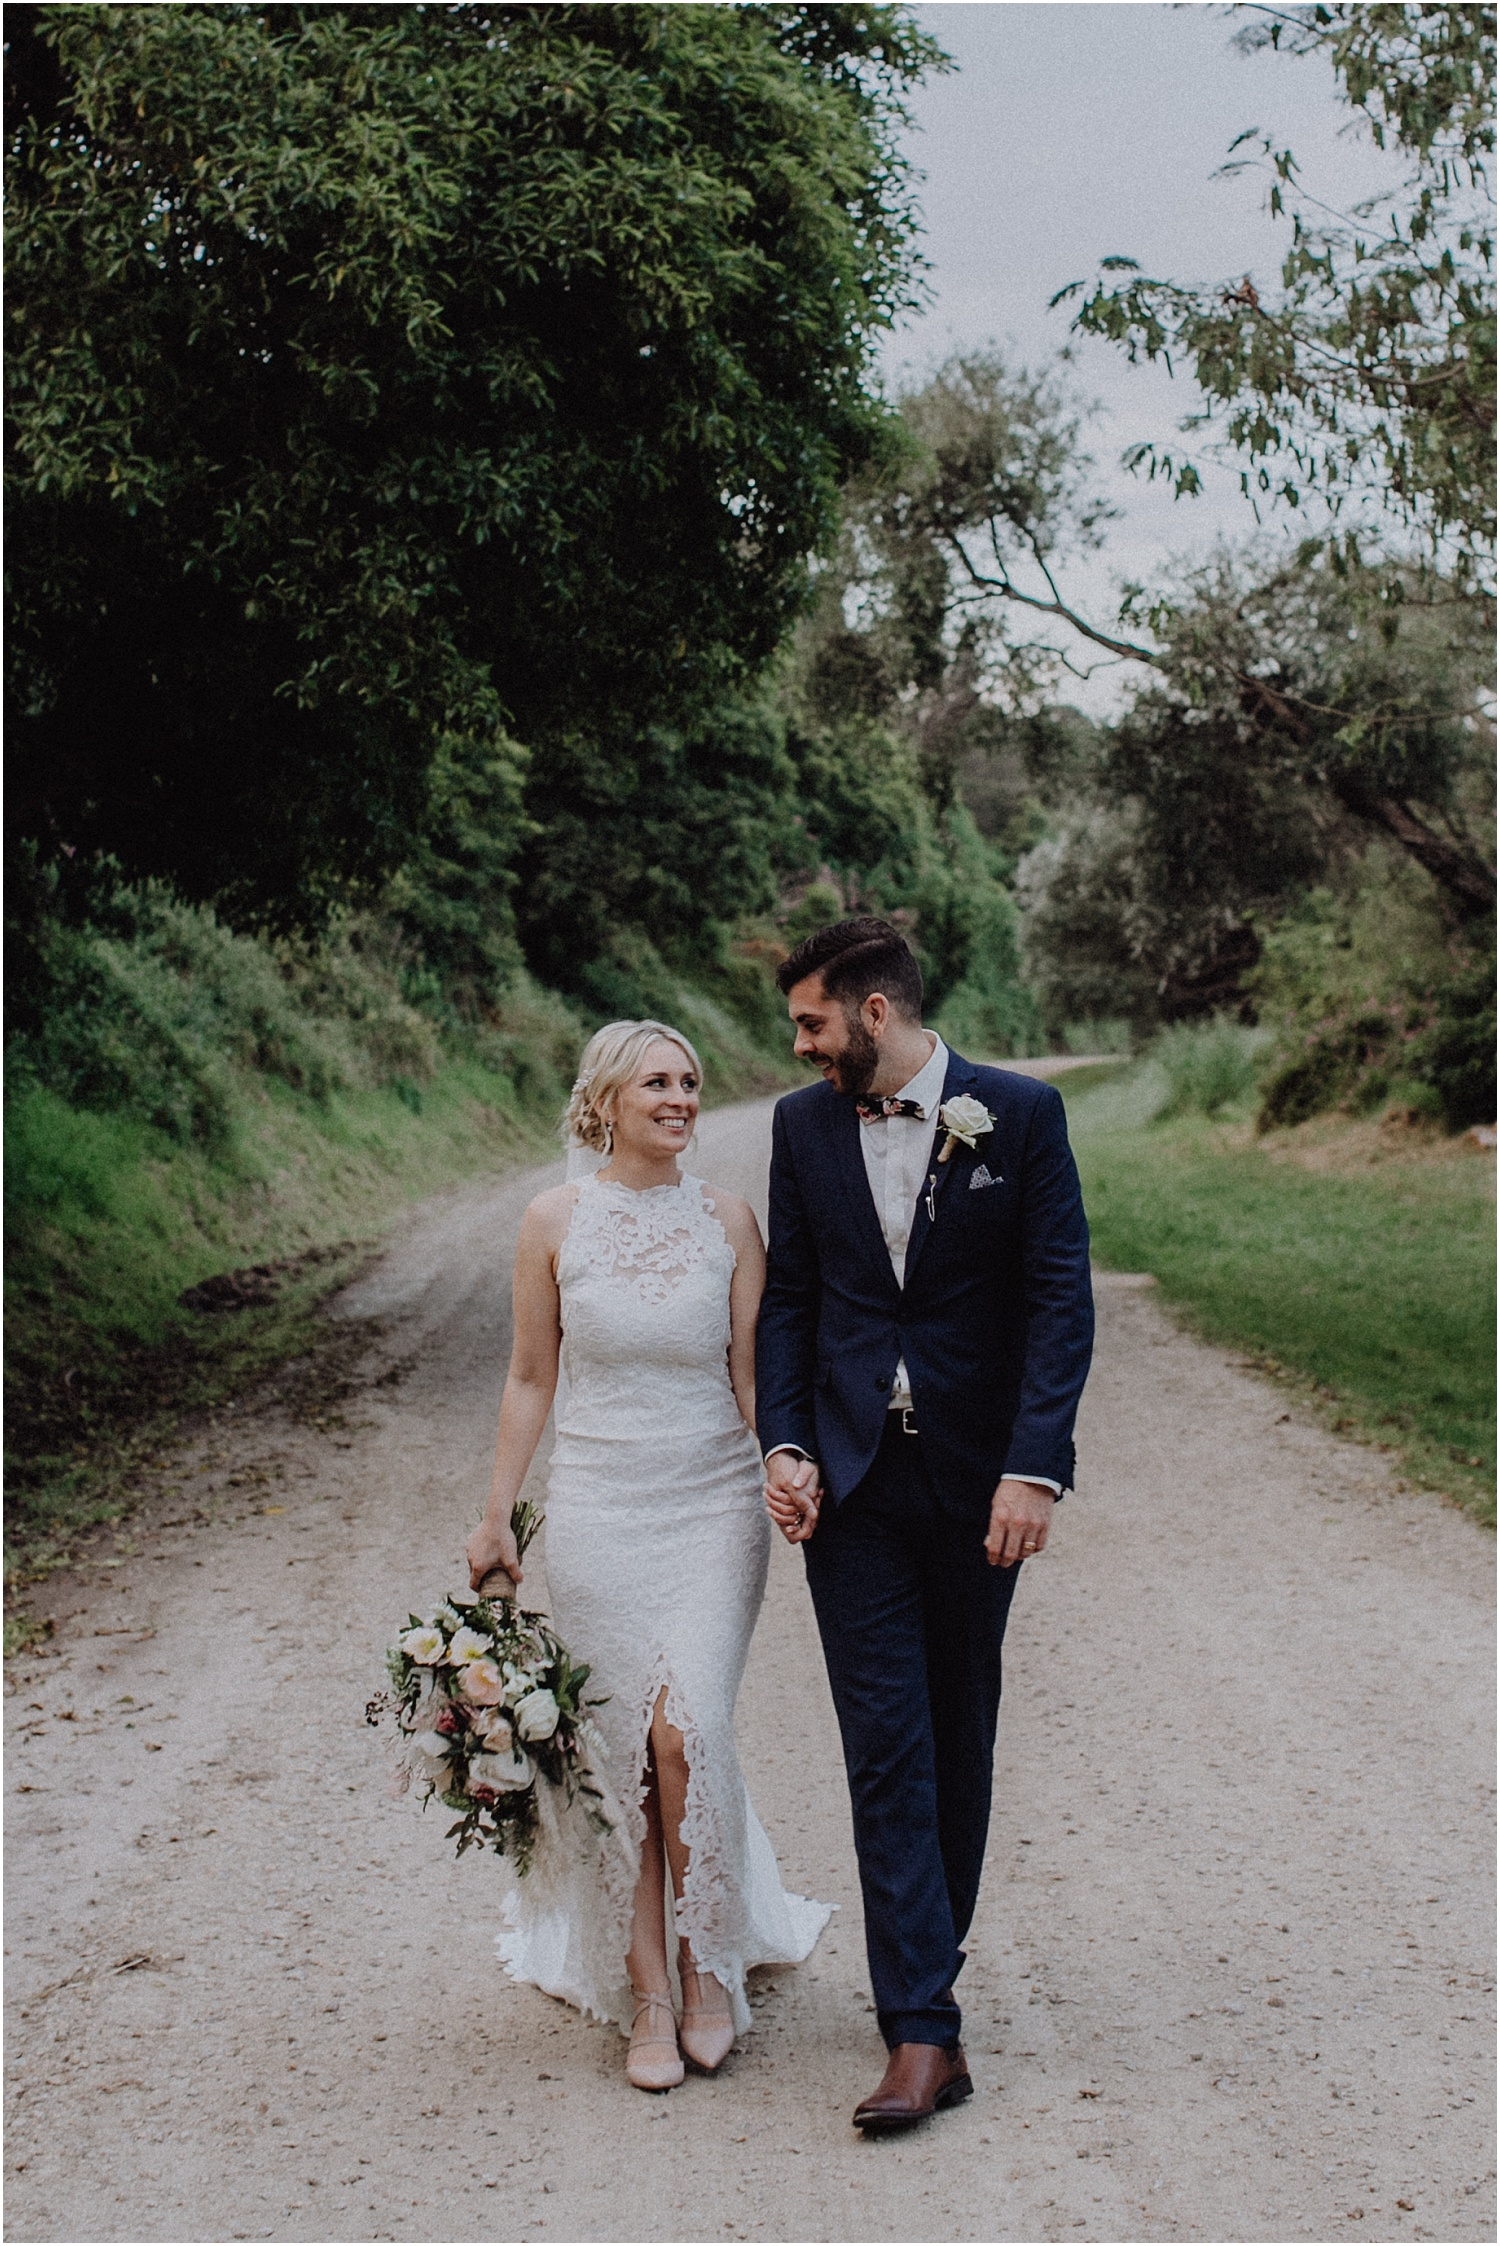 Nicolle and Damien's tipi wedding at the Flinders Yacht Club on the Mornington Peninsula._0192.jpg